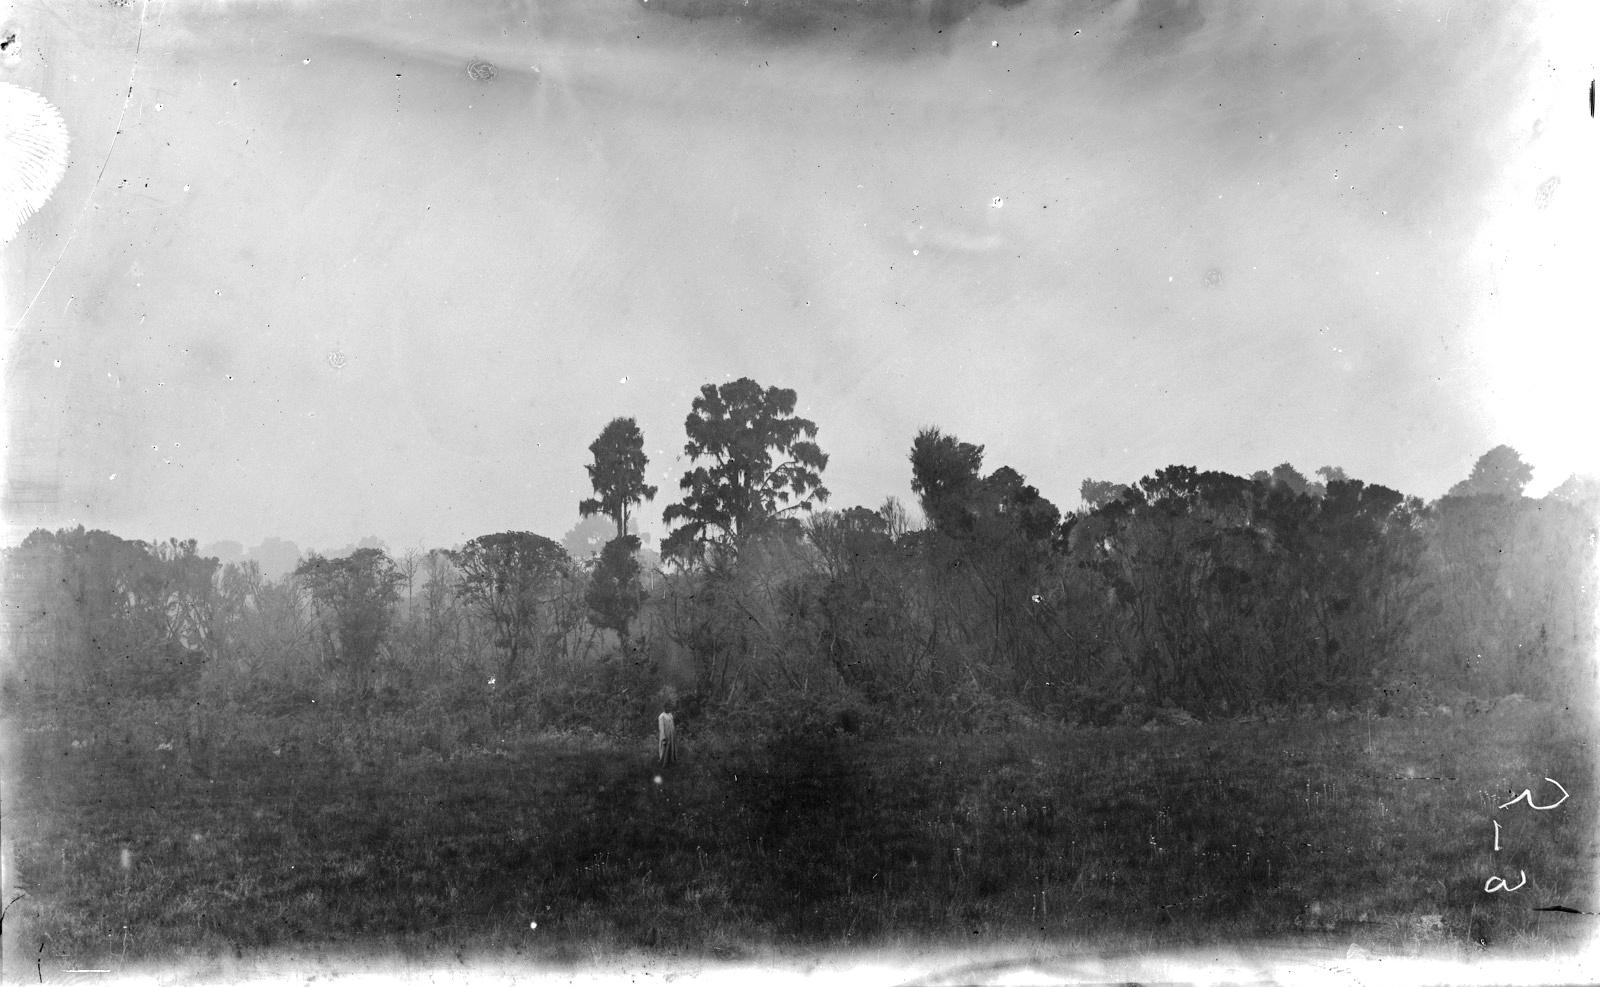 361. Вид на луг на верхней границе джунглей к югу от Мавензи